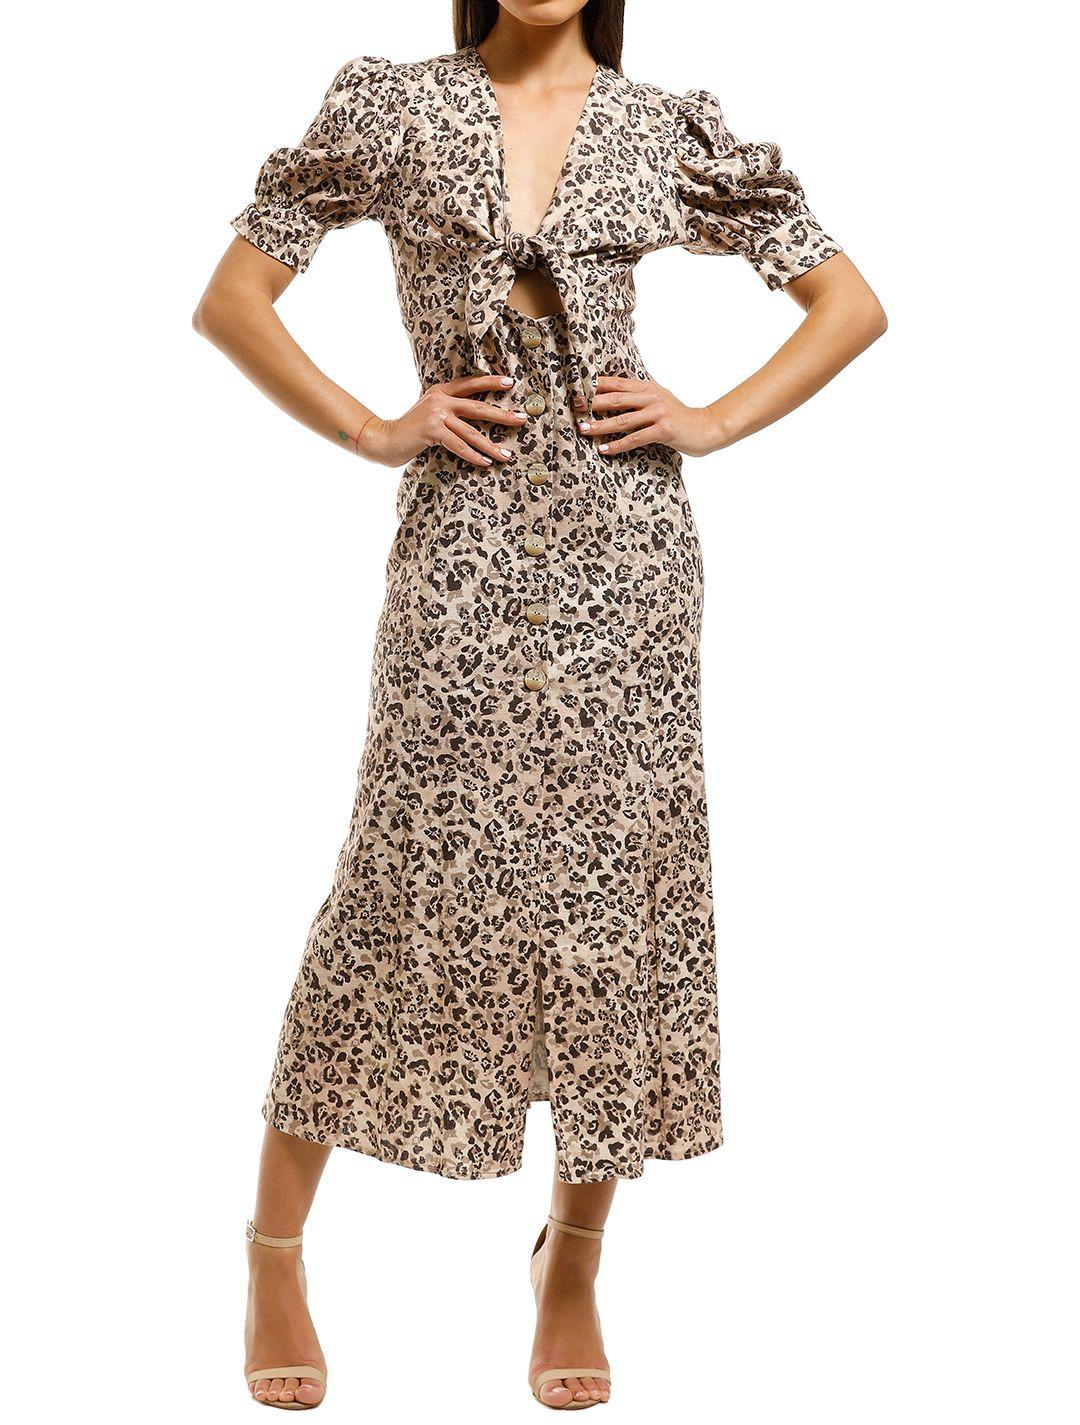 Pasduchas-Charisma-Midi-Dress-Mocha-Front